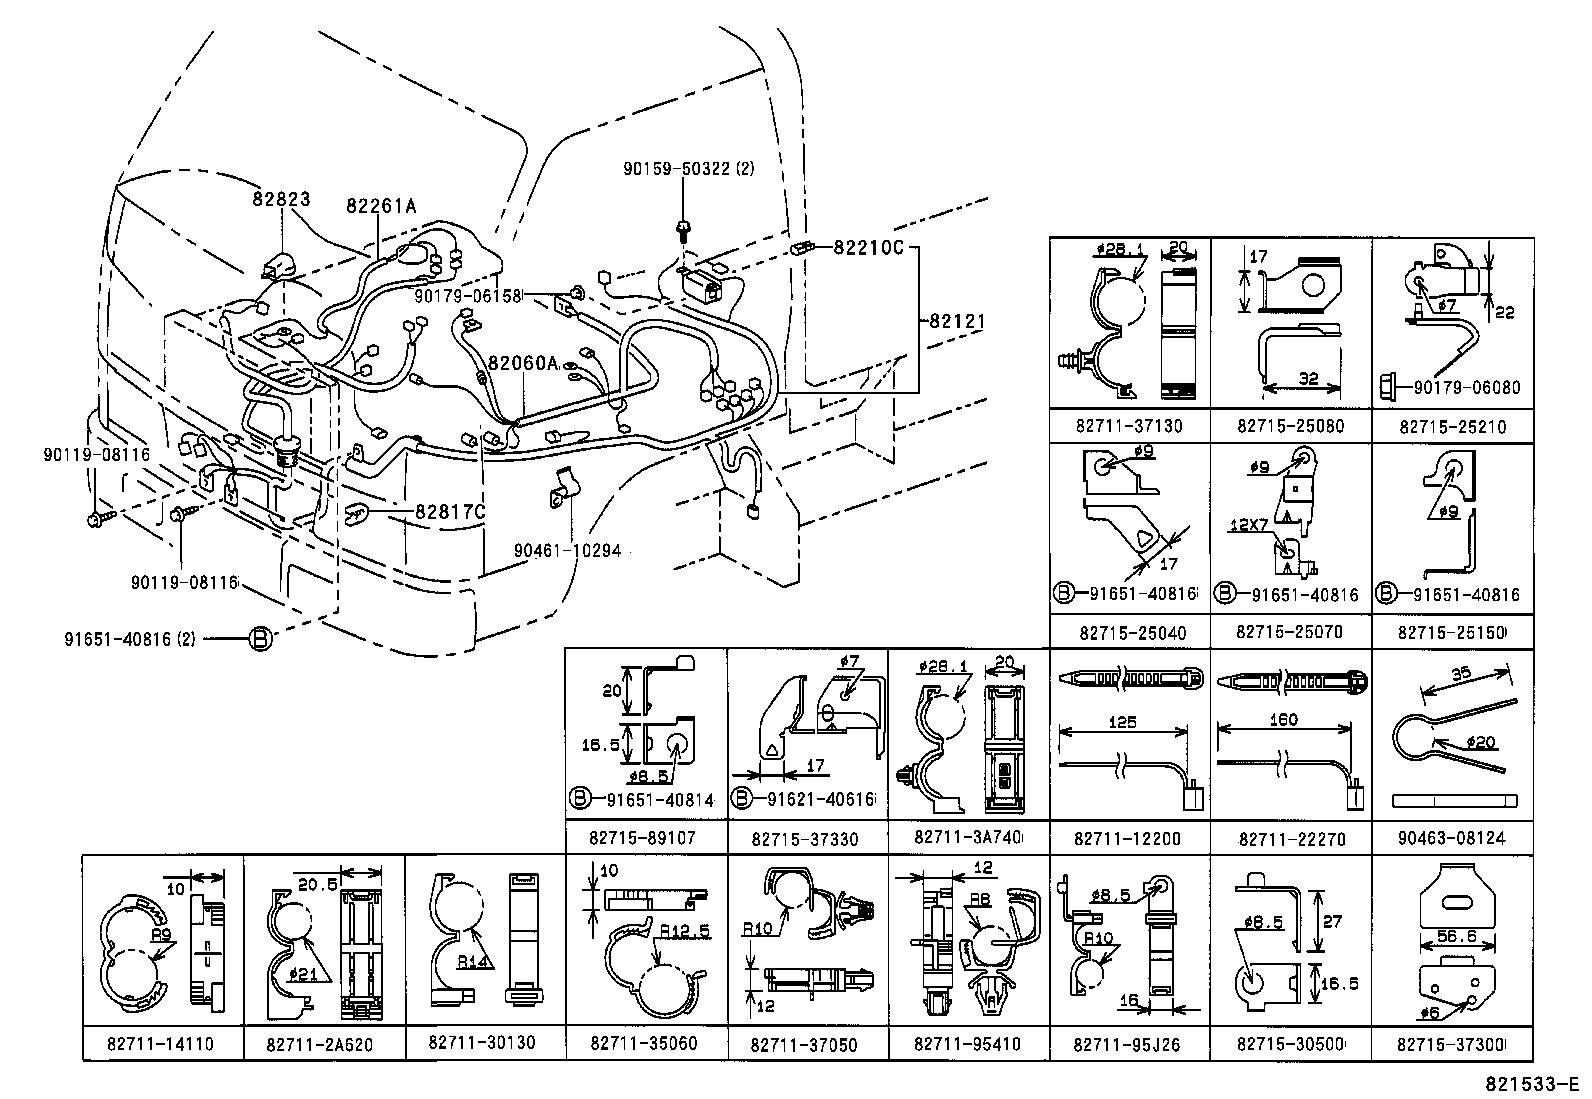 hight resolution of toyota dyna wiring diagram free wiring diagram for you u2022 rh evolvedlife store dyna coil wiring diagram dyna ignition coils wiring diagram